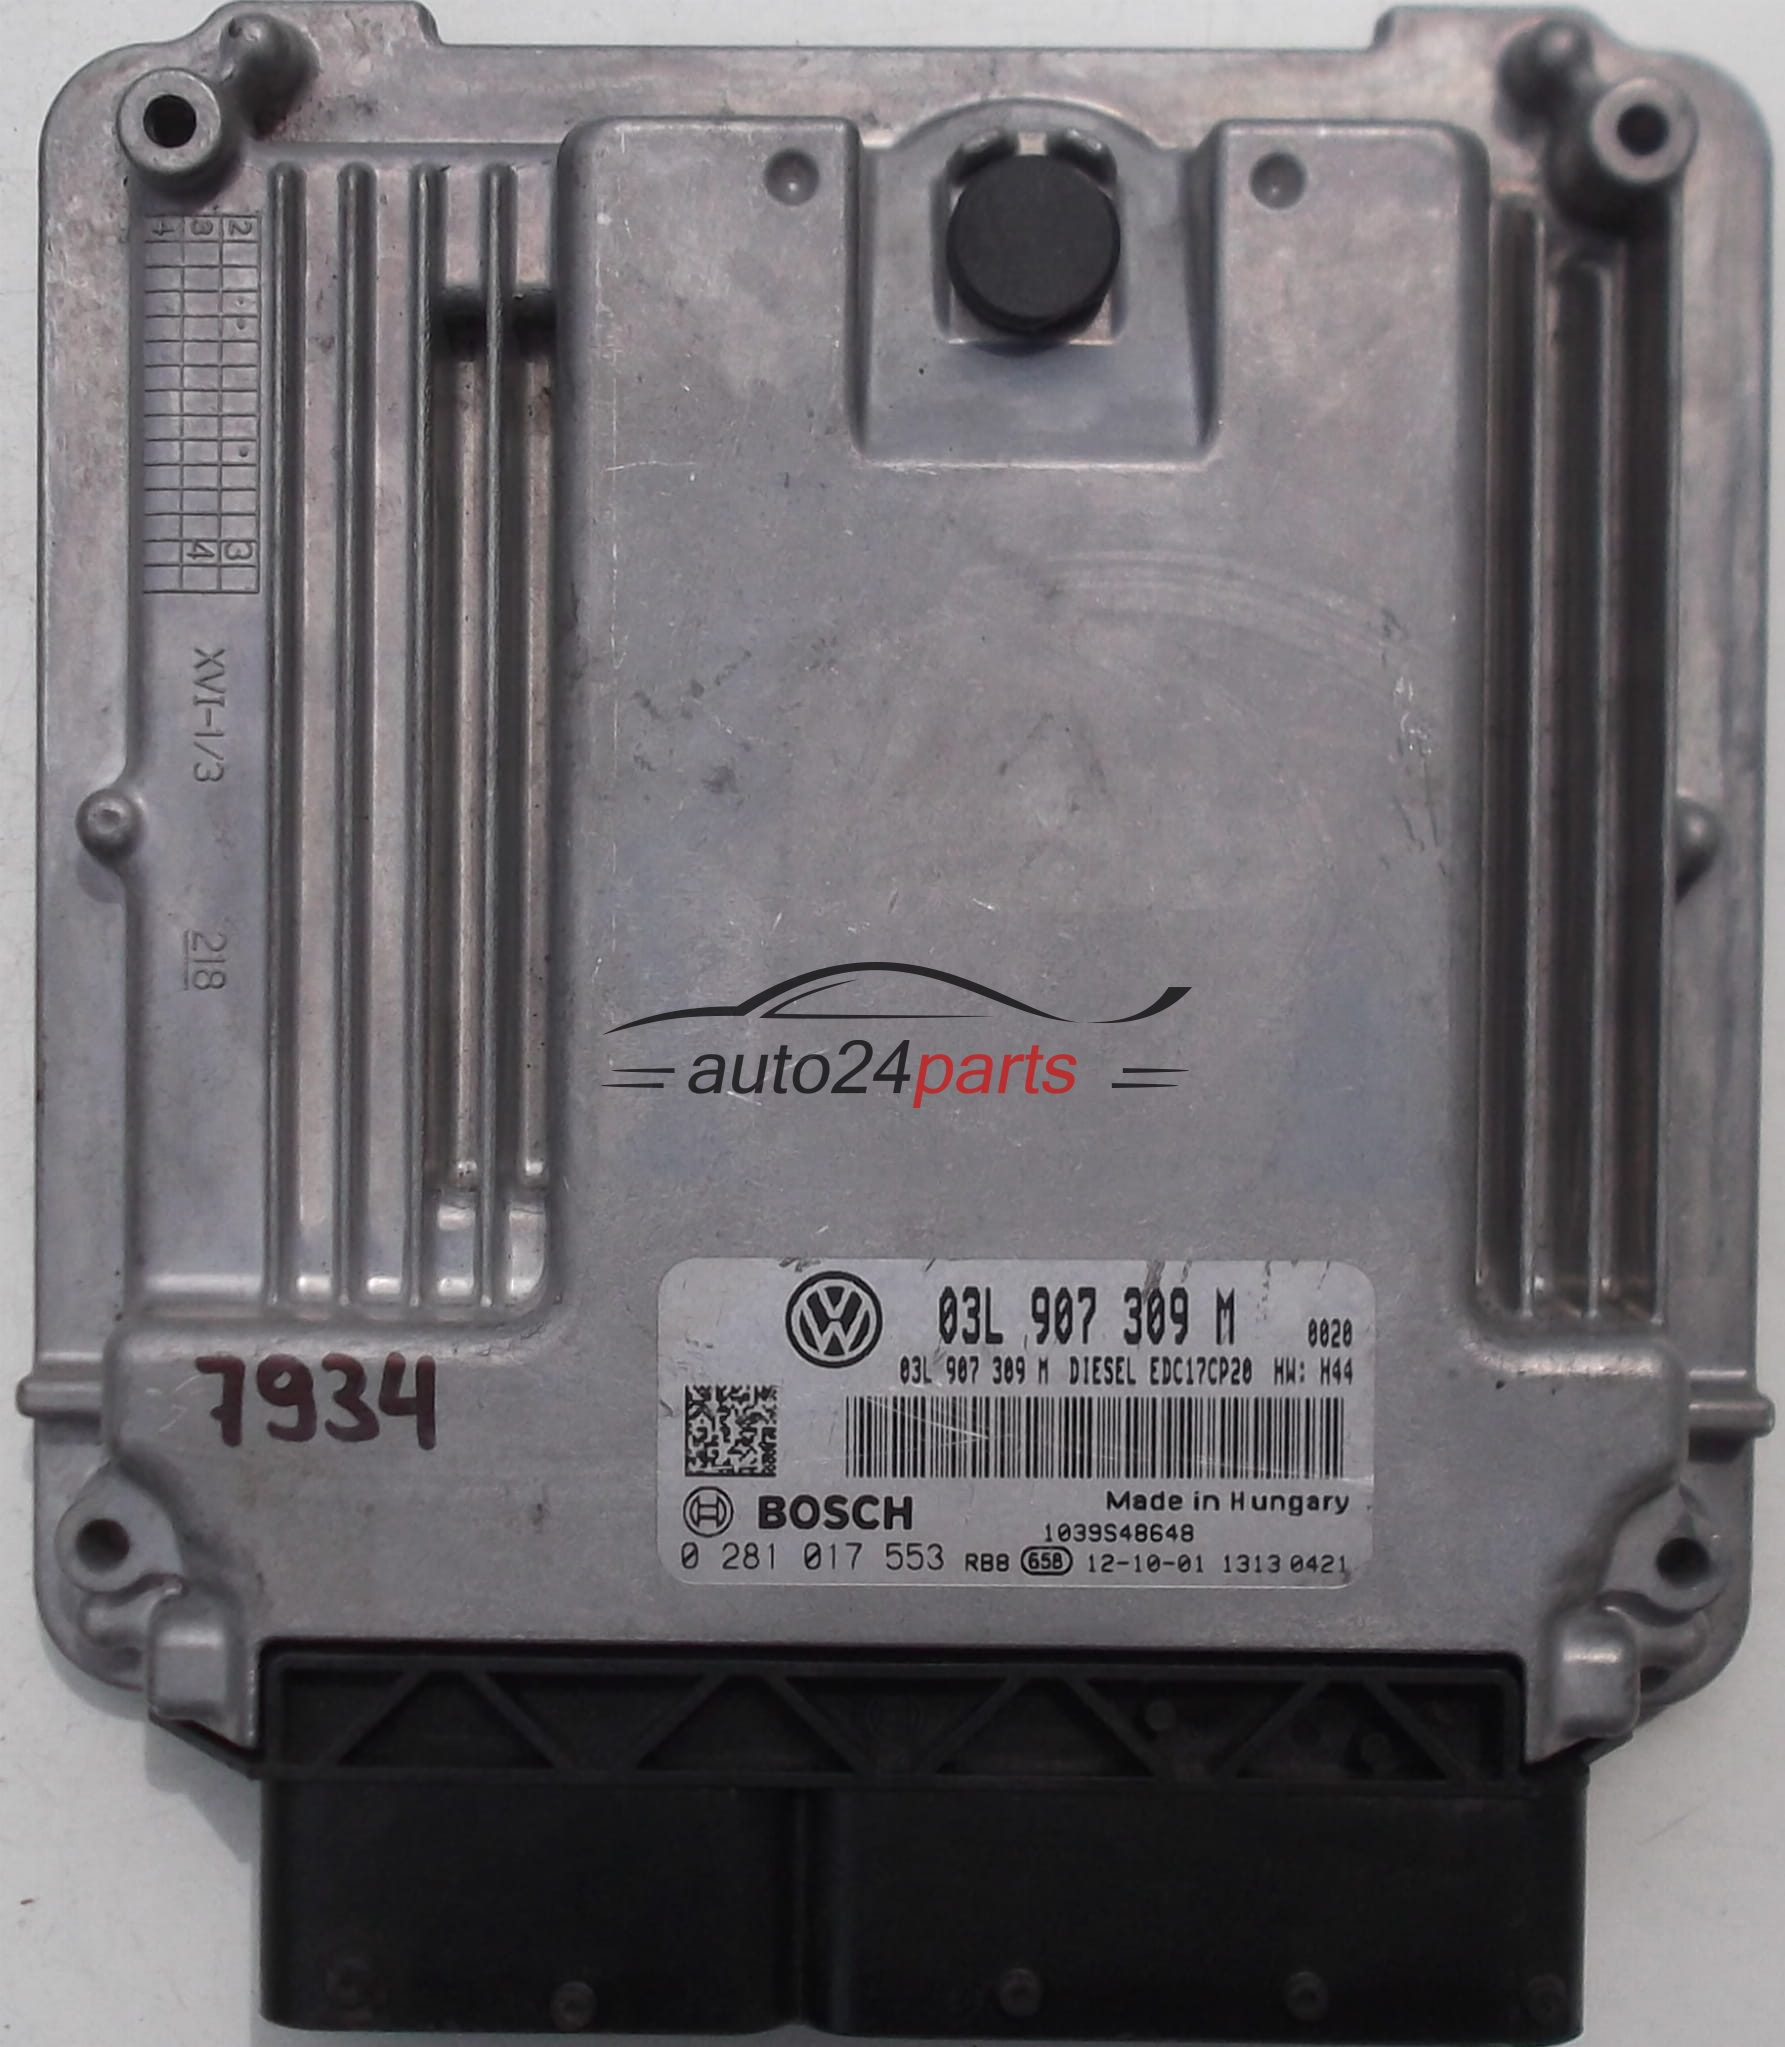 ECU ENGINE CONTROLLER VW VOLKSWAGEN T5 TRANSOPRTER 2 0 TDI, BOSCH 0 281 017  553, BOSCH 0281017553, 03L 907 309 M, 03L907309M